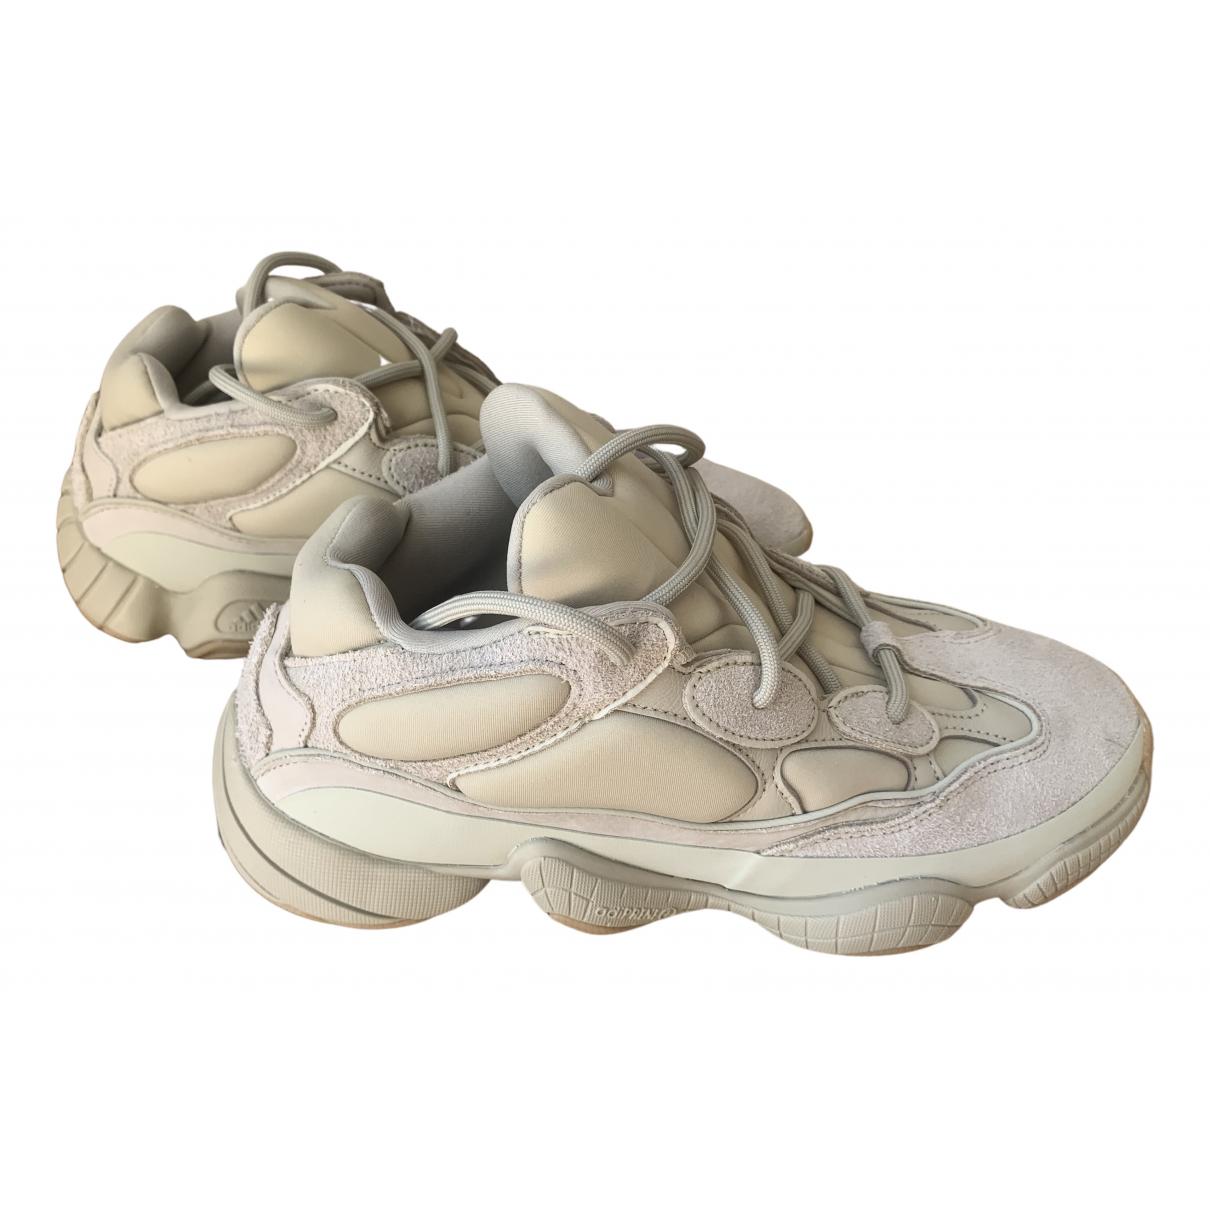 Deportivas 500 Yeezy X Adidas